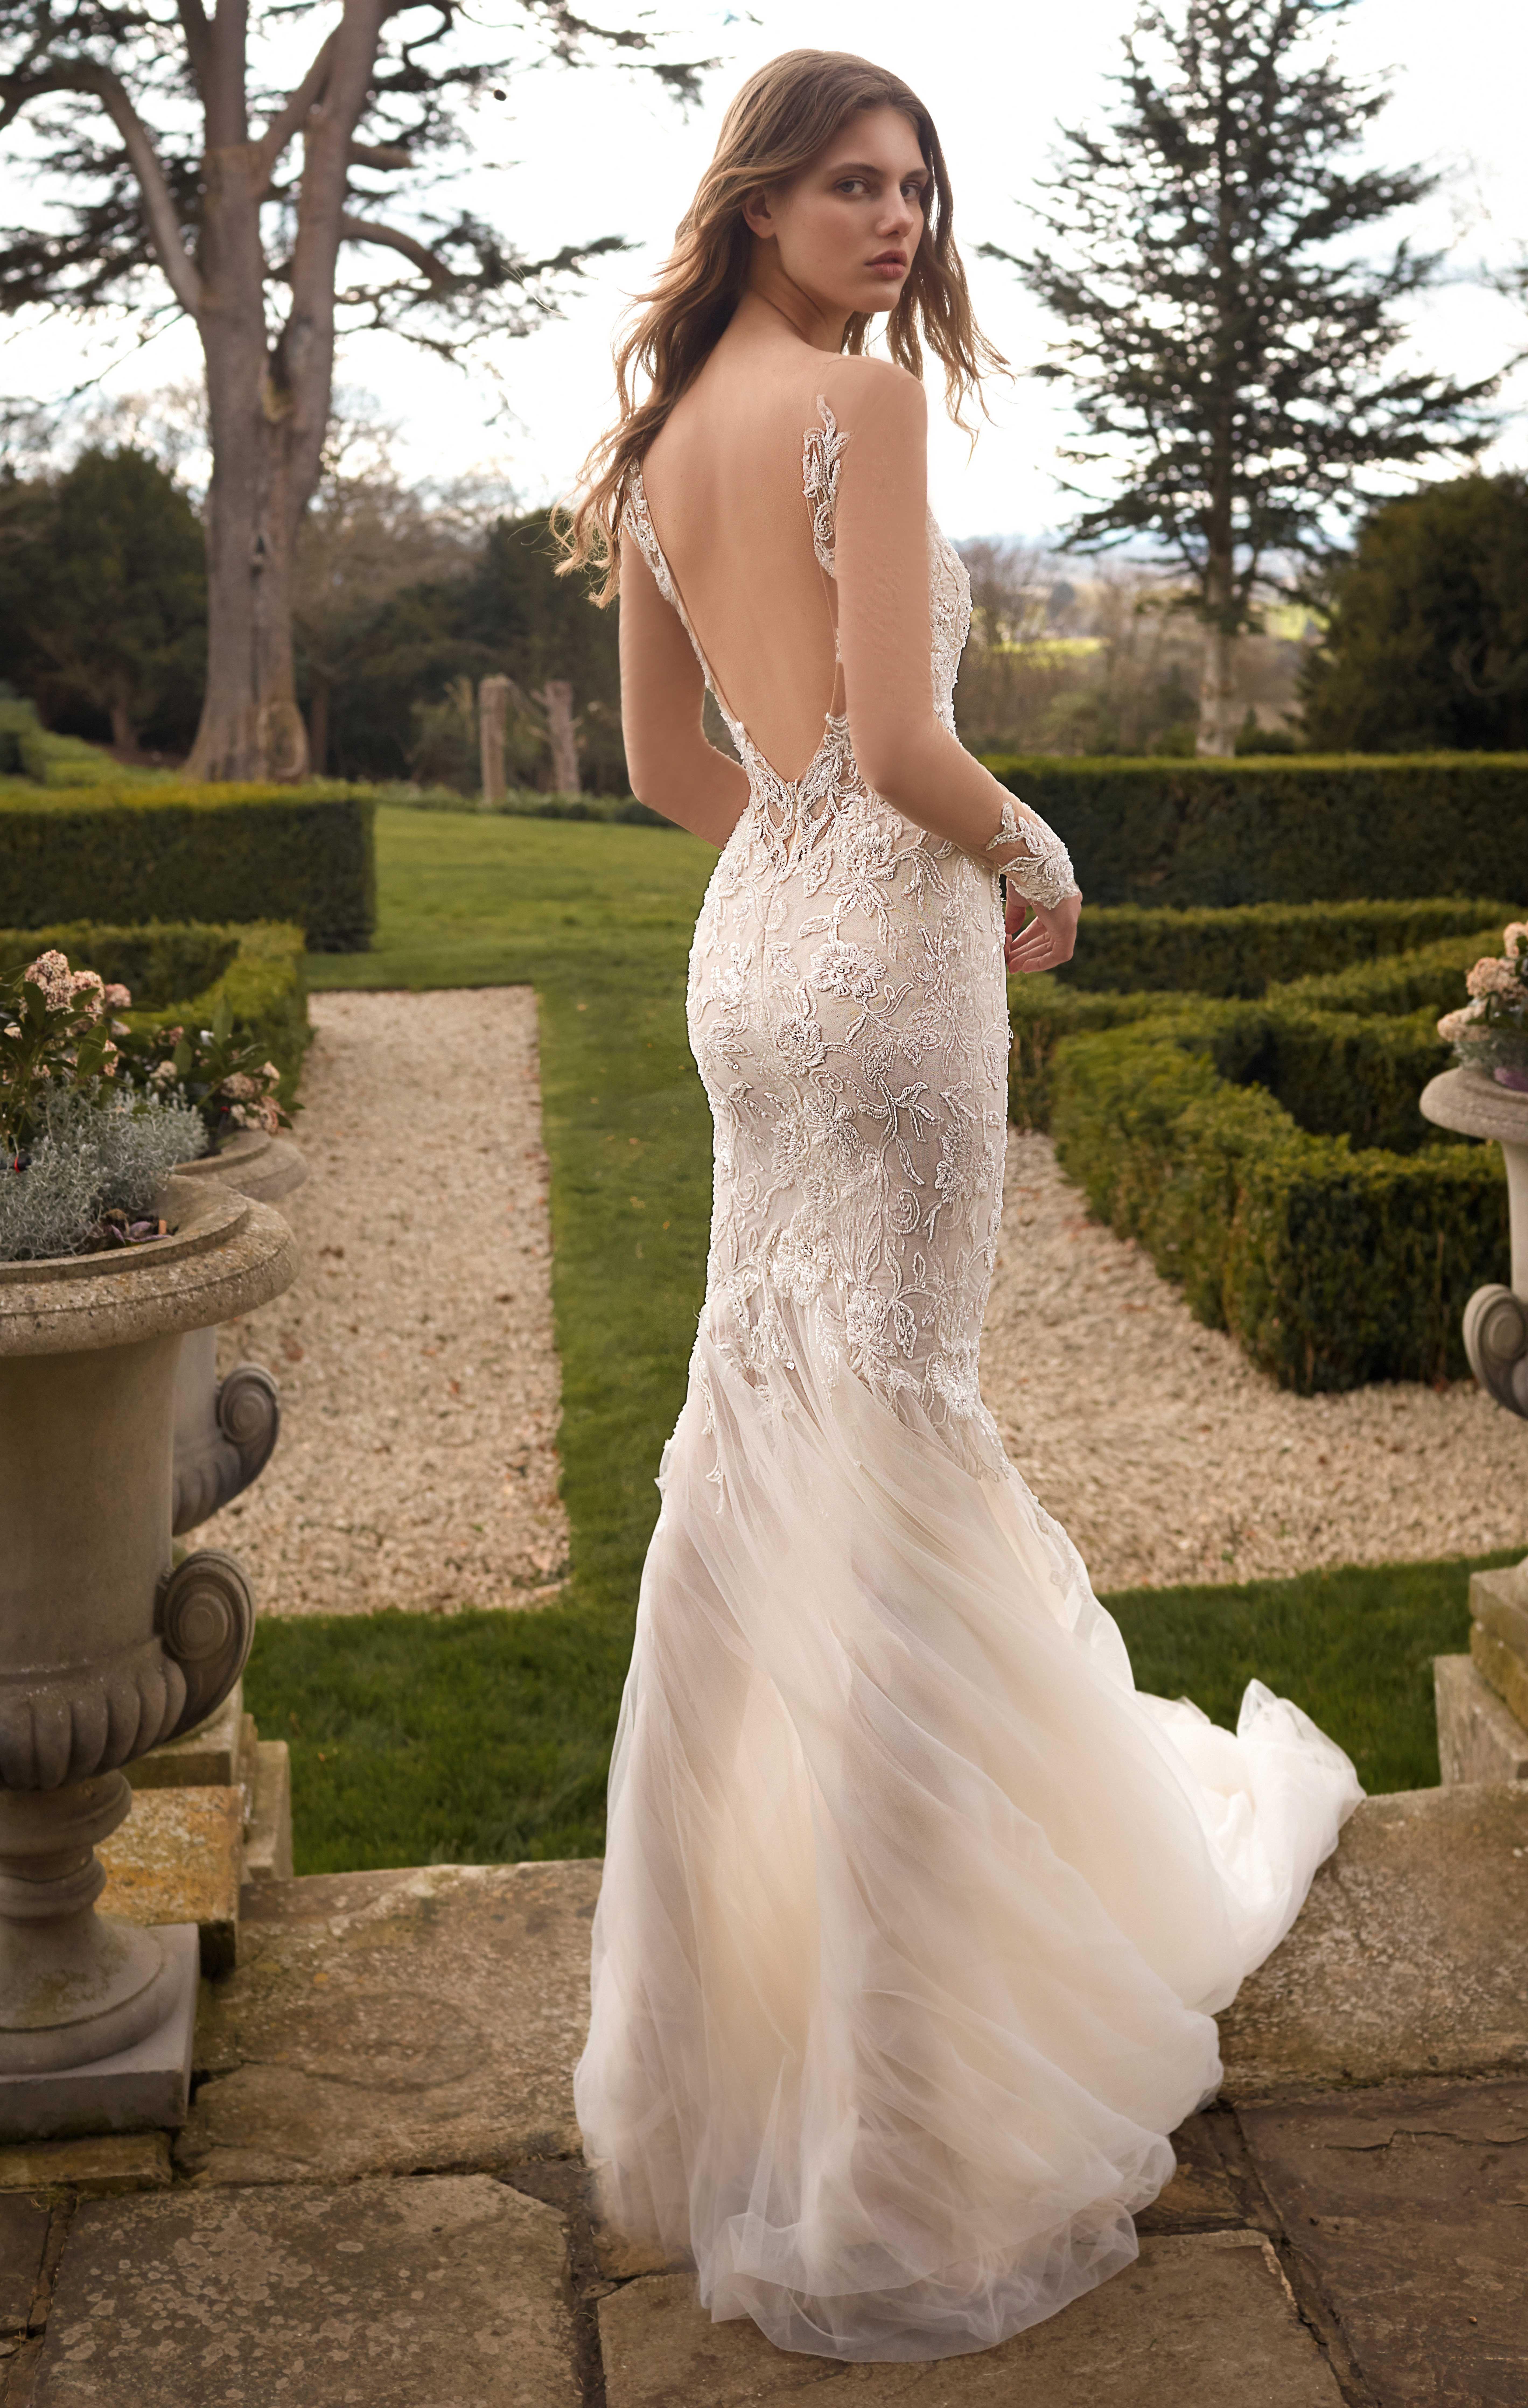 Galia Lahav Low Back Lacey Bridal Gown High Neck Long Sleeve Wedding Dress Sparkle Wedding Dress Mermaid Wedding Dress [ 8944 x 5675 Pixel ]